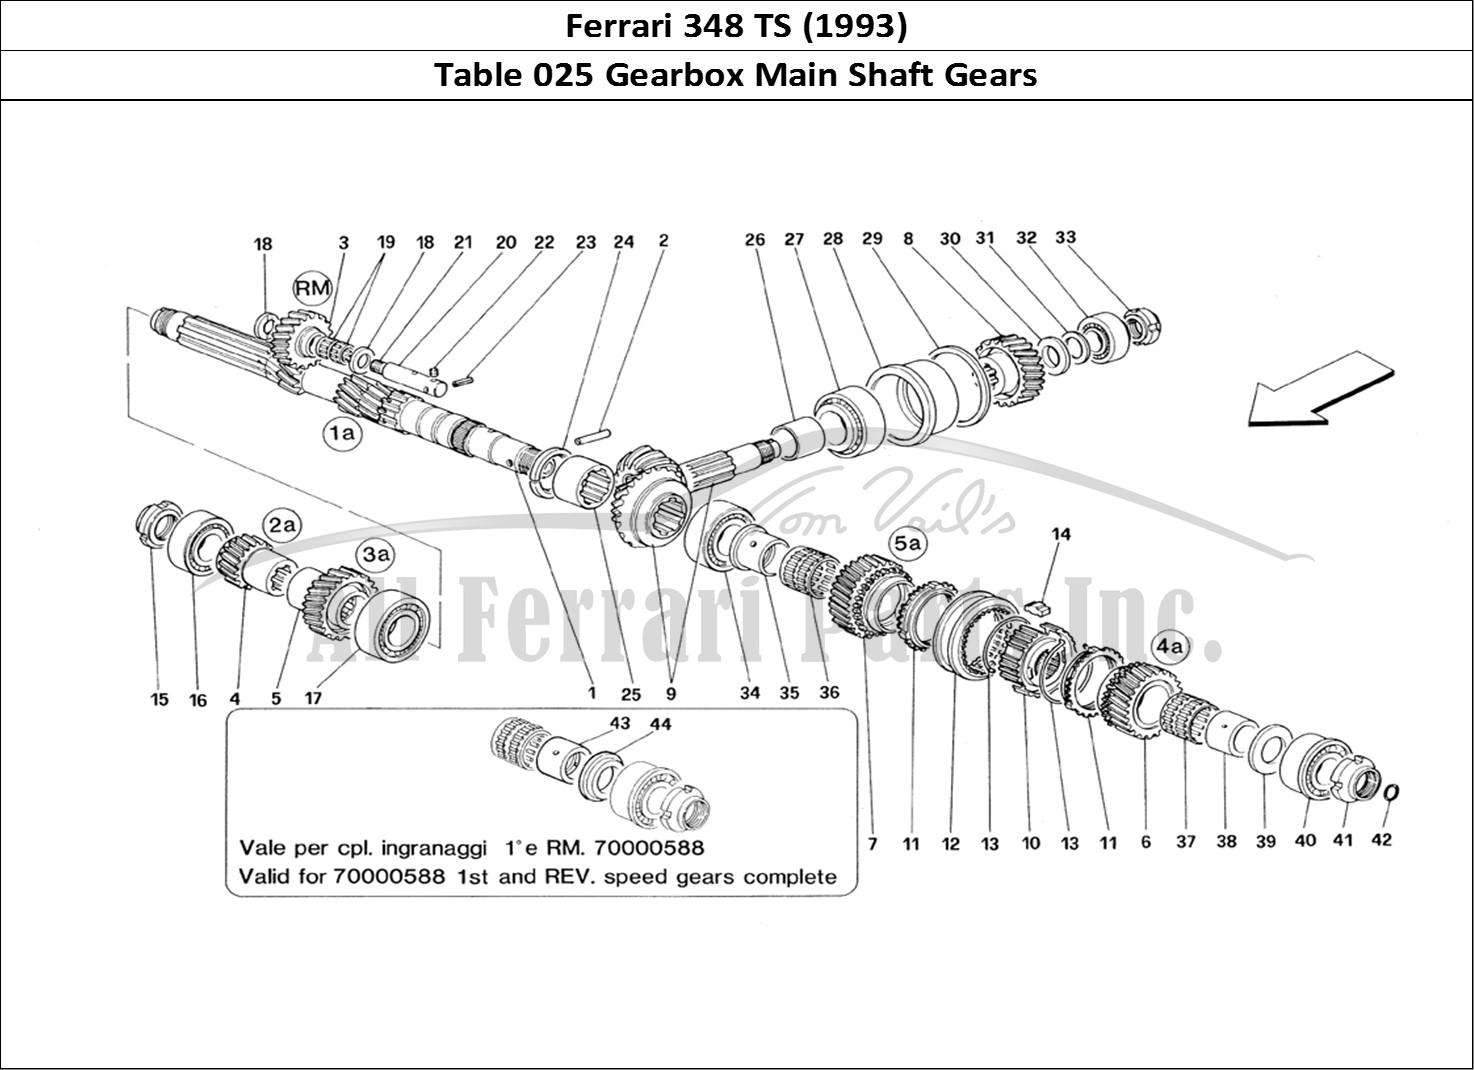 Buy Original Ferrari 348 Ts 025 Gearbox Main Shaft